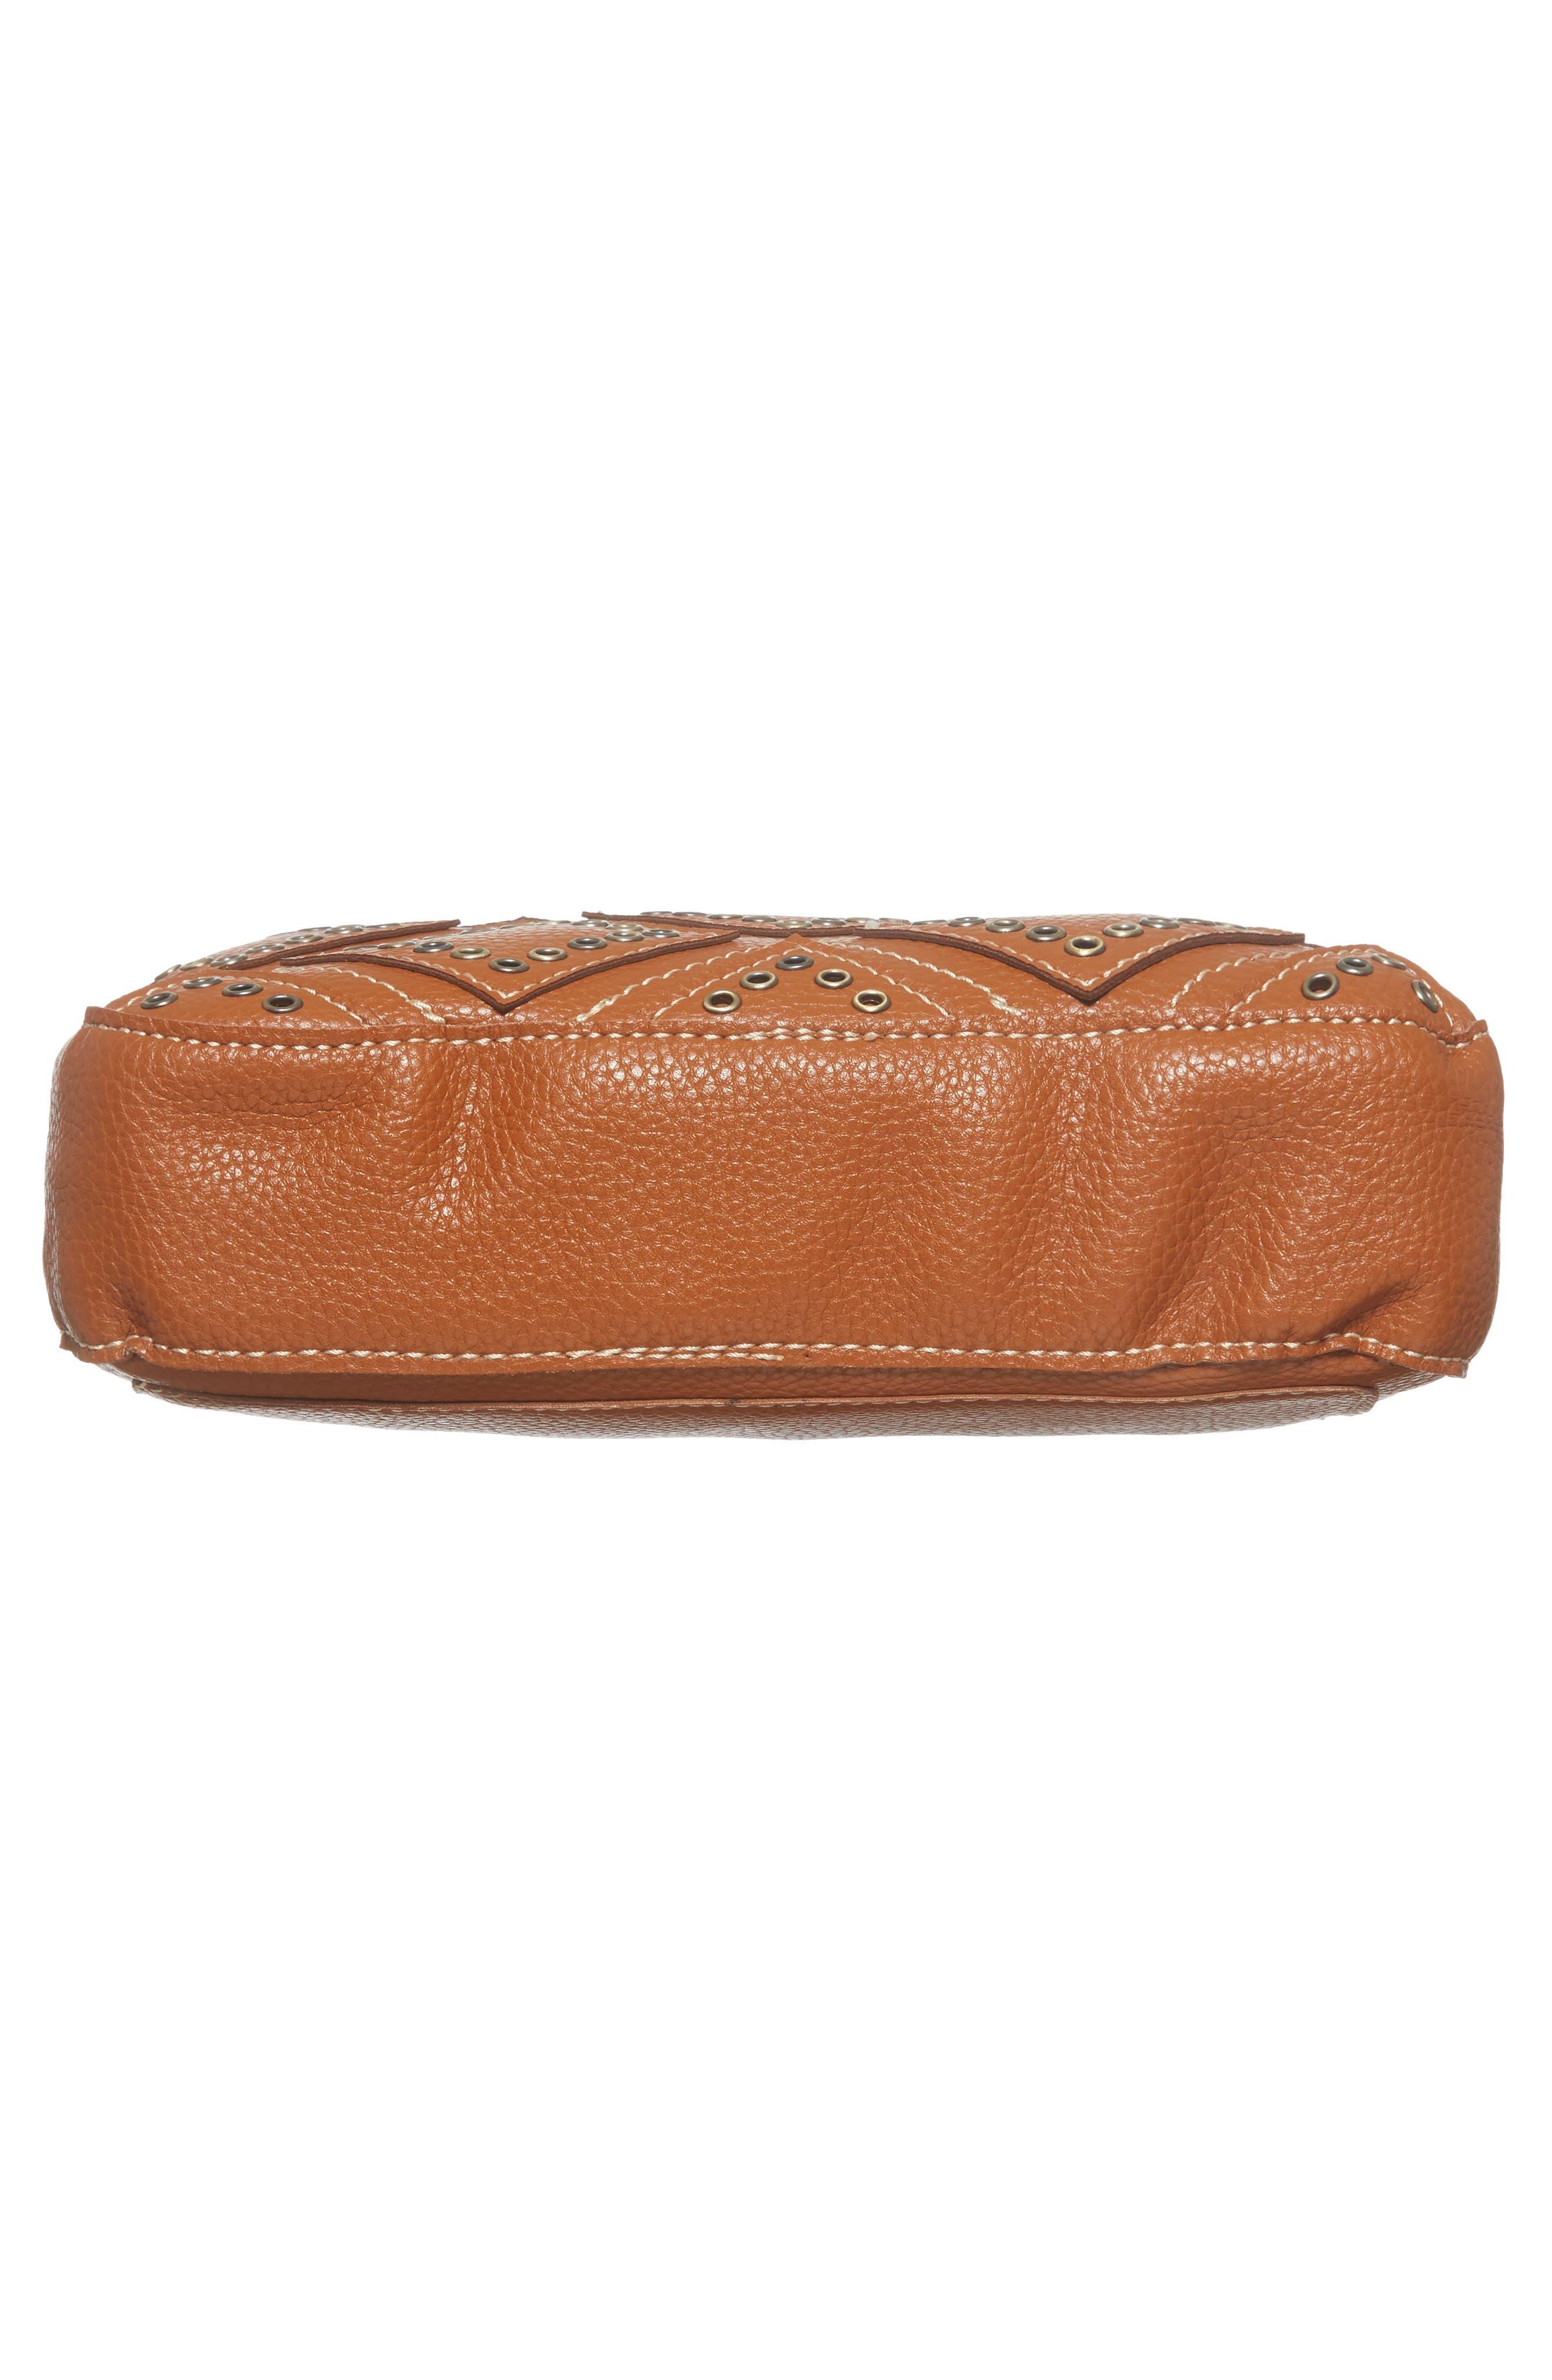 Skylar Faux Leather Crossbody Bag,                             Alternate thumbnail 6, color,                             211